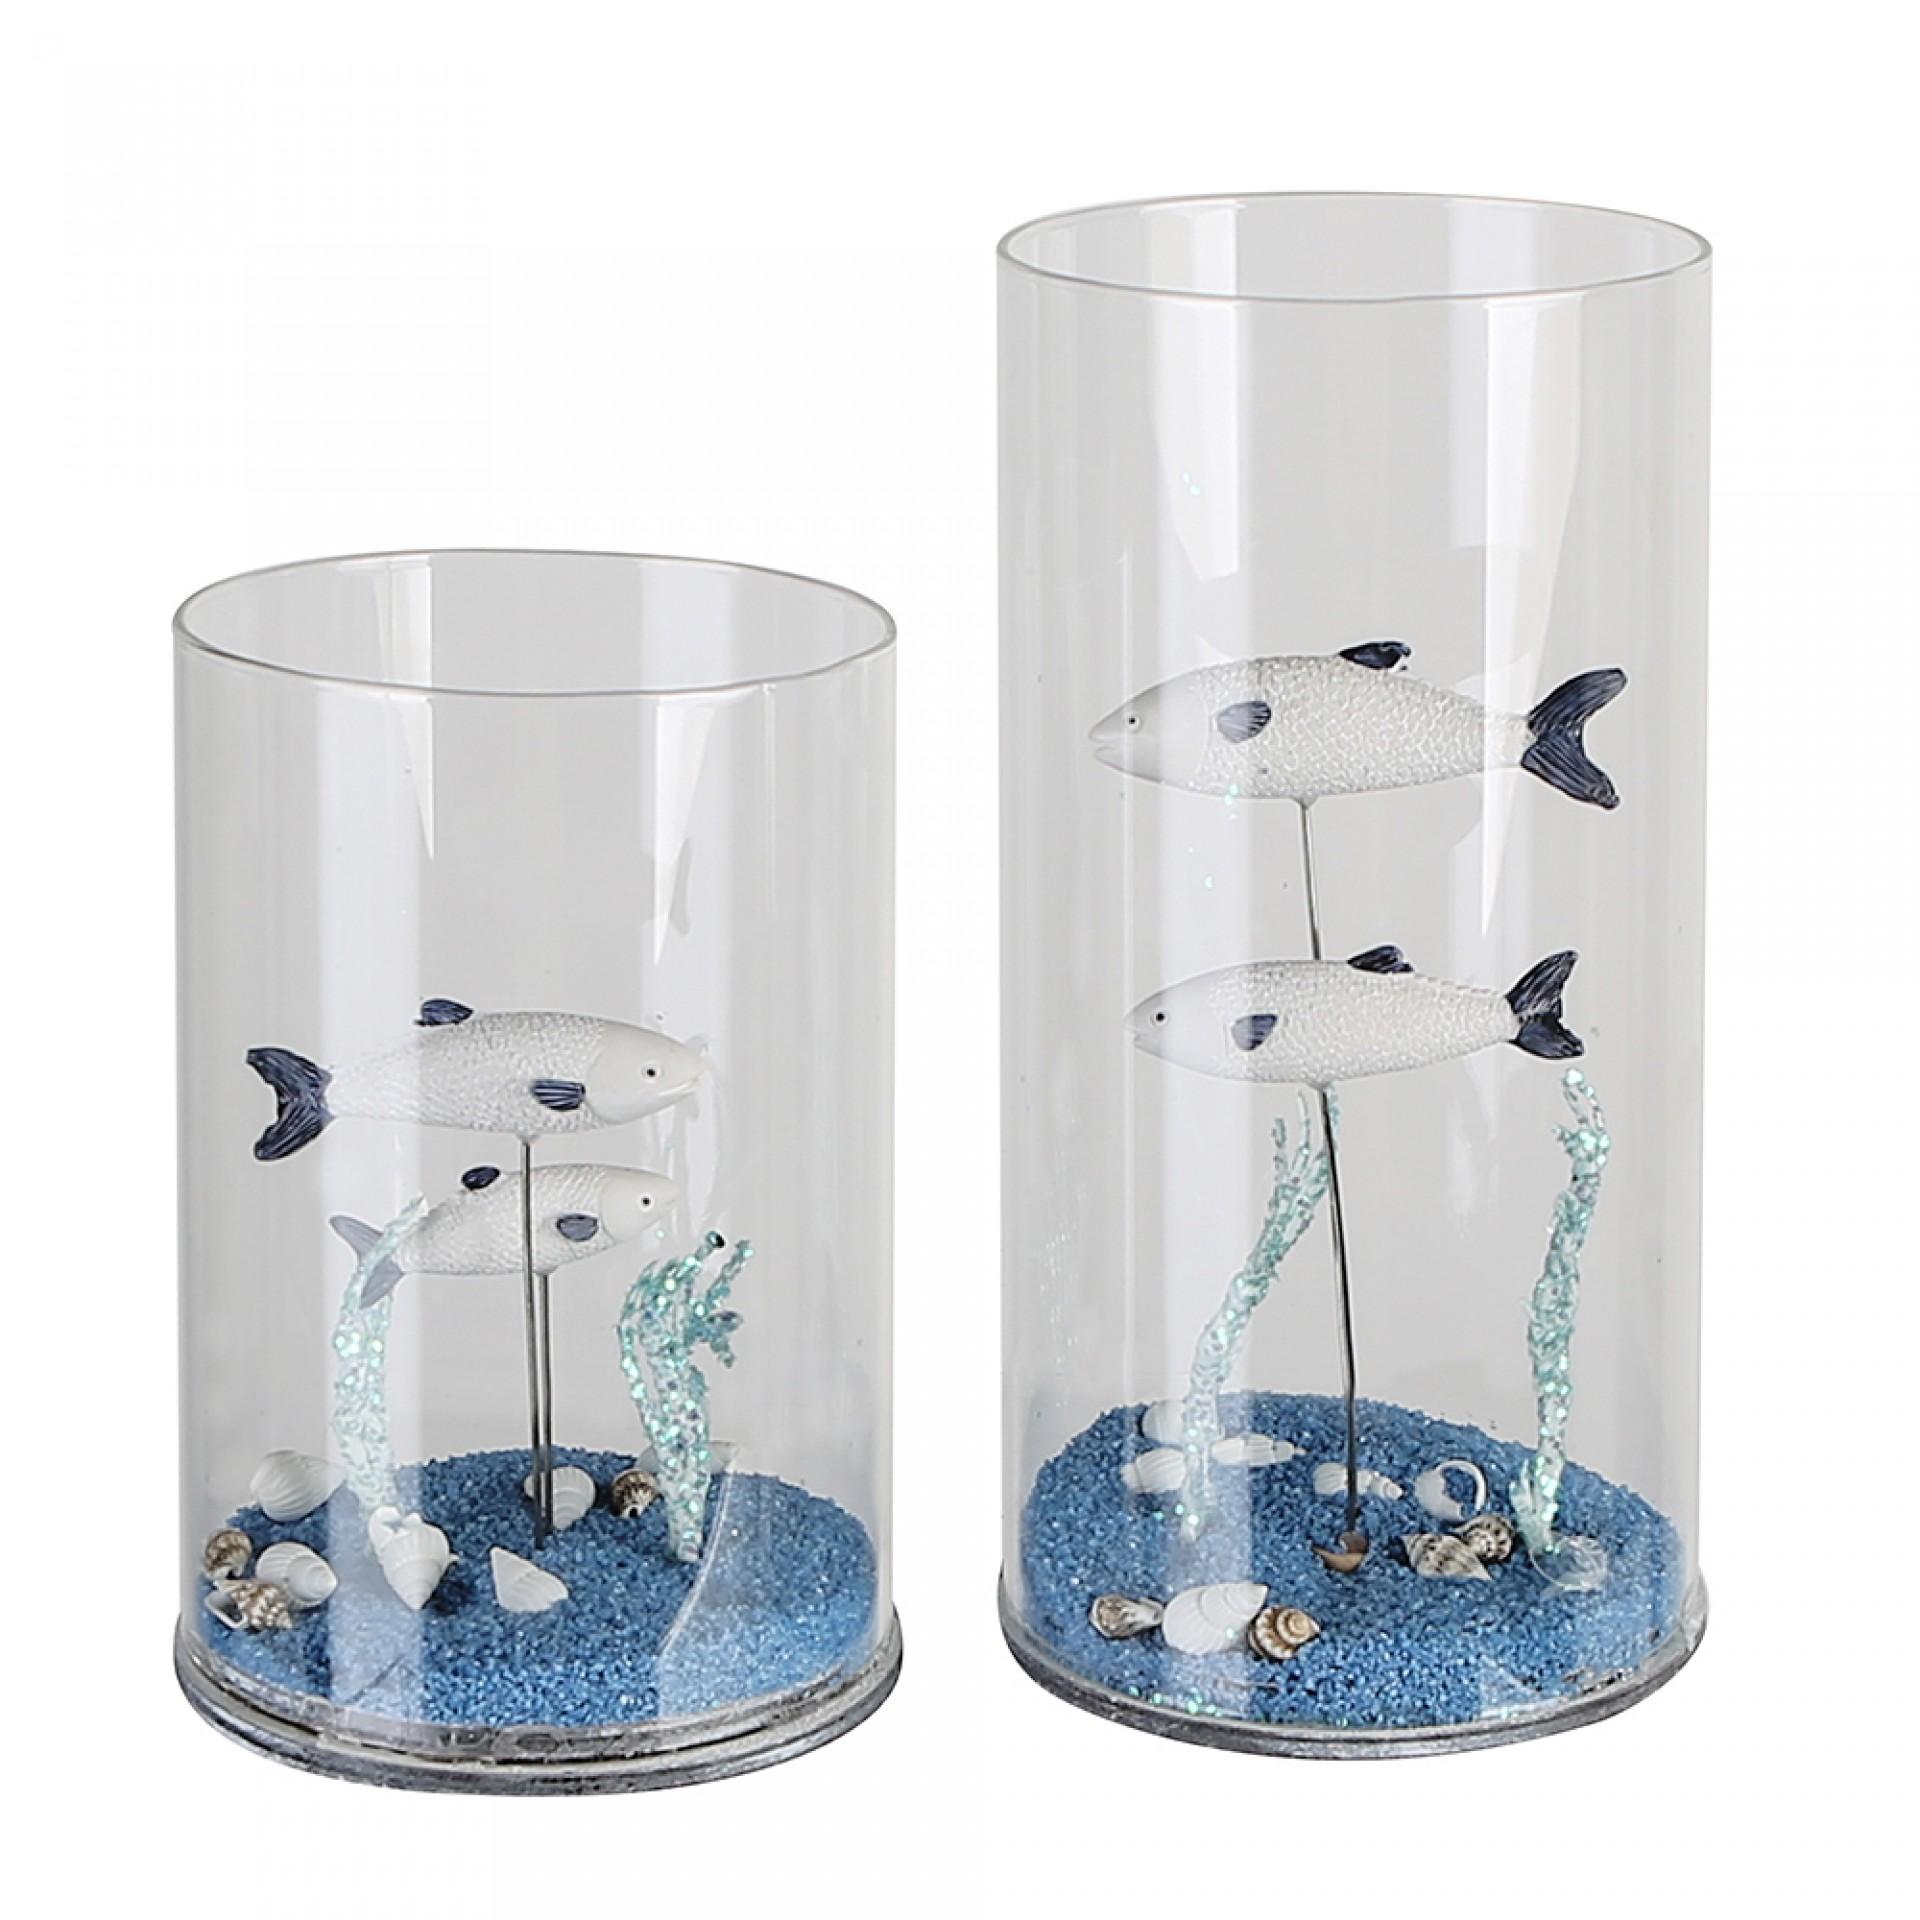 Skleněná dekorace Aquarium, 20 cm, vícebarevná